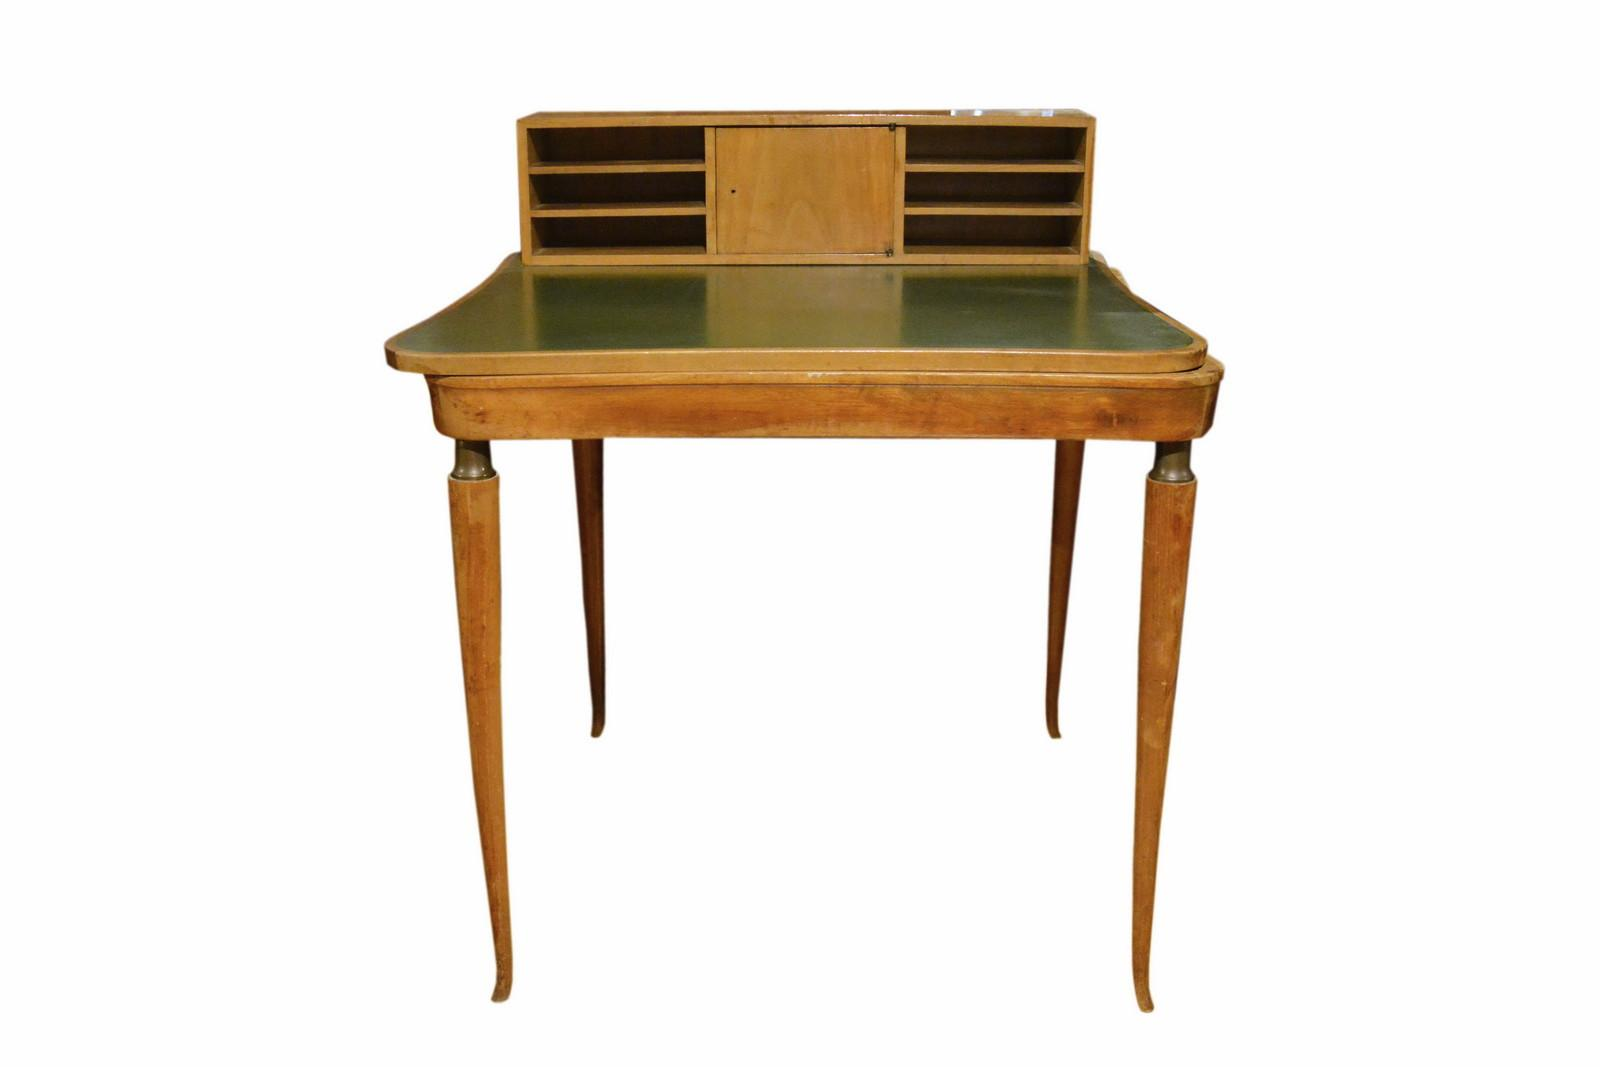 tavolo-inglese-anni-20-scrittorio-e-gioco-poker-6,2962.jpg?WebbinsCacheCounter=1